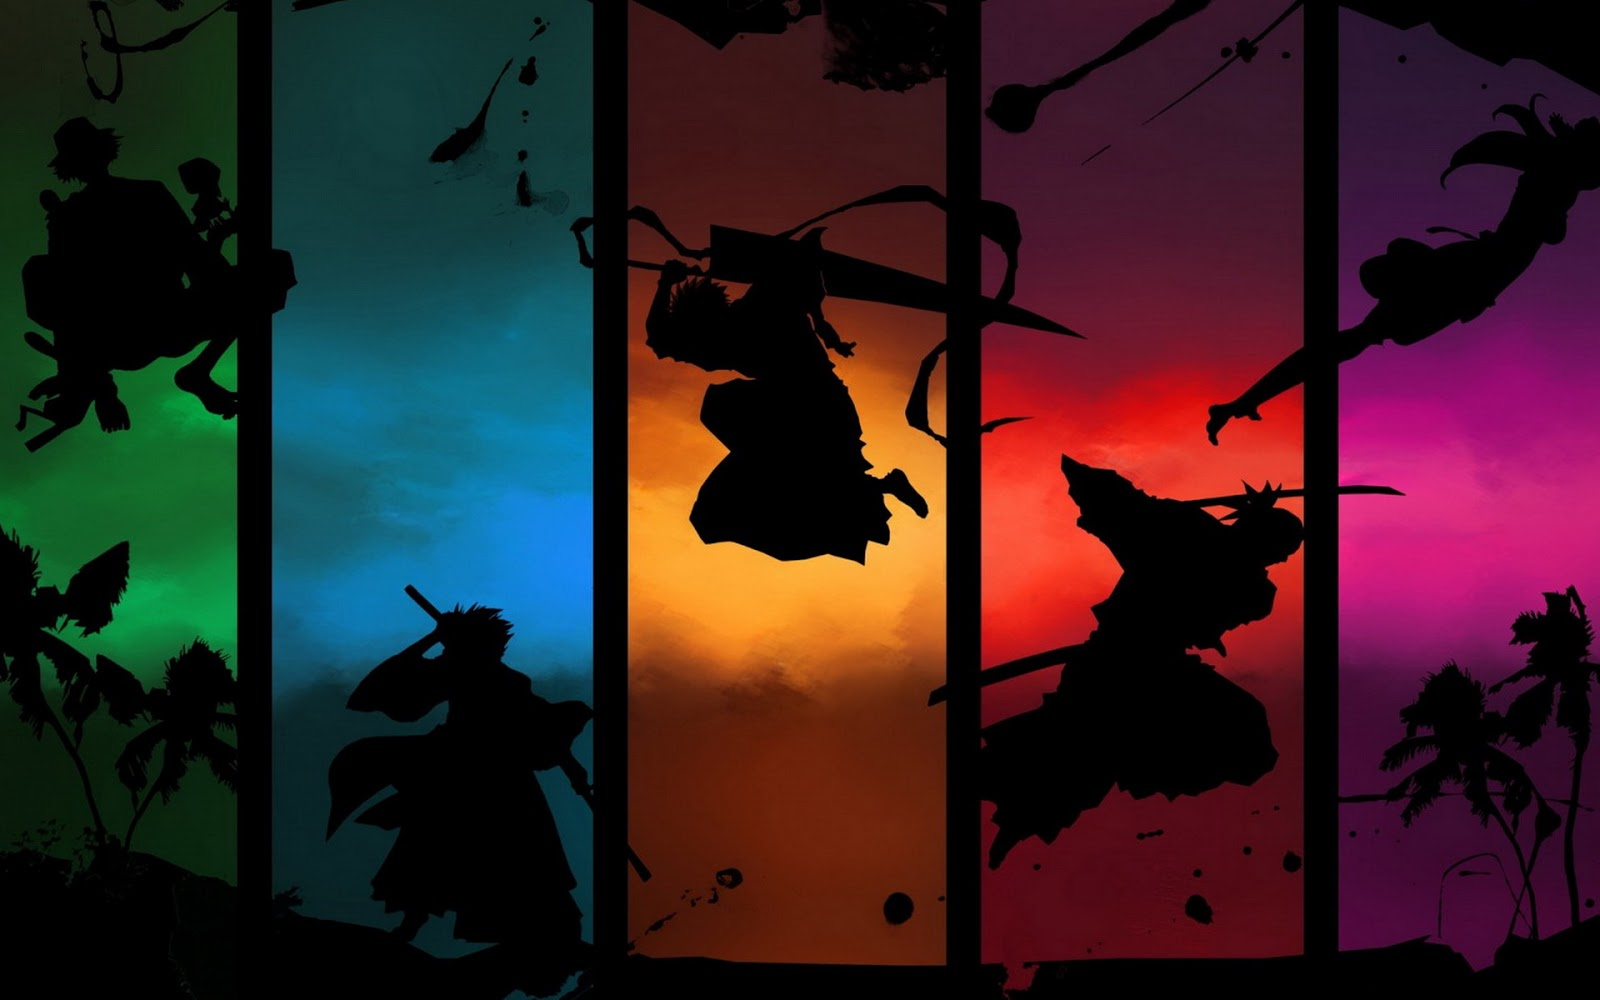 Latest Comics Episode Anime Wallpaper Widescreen